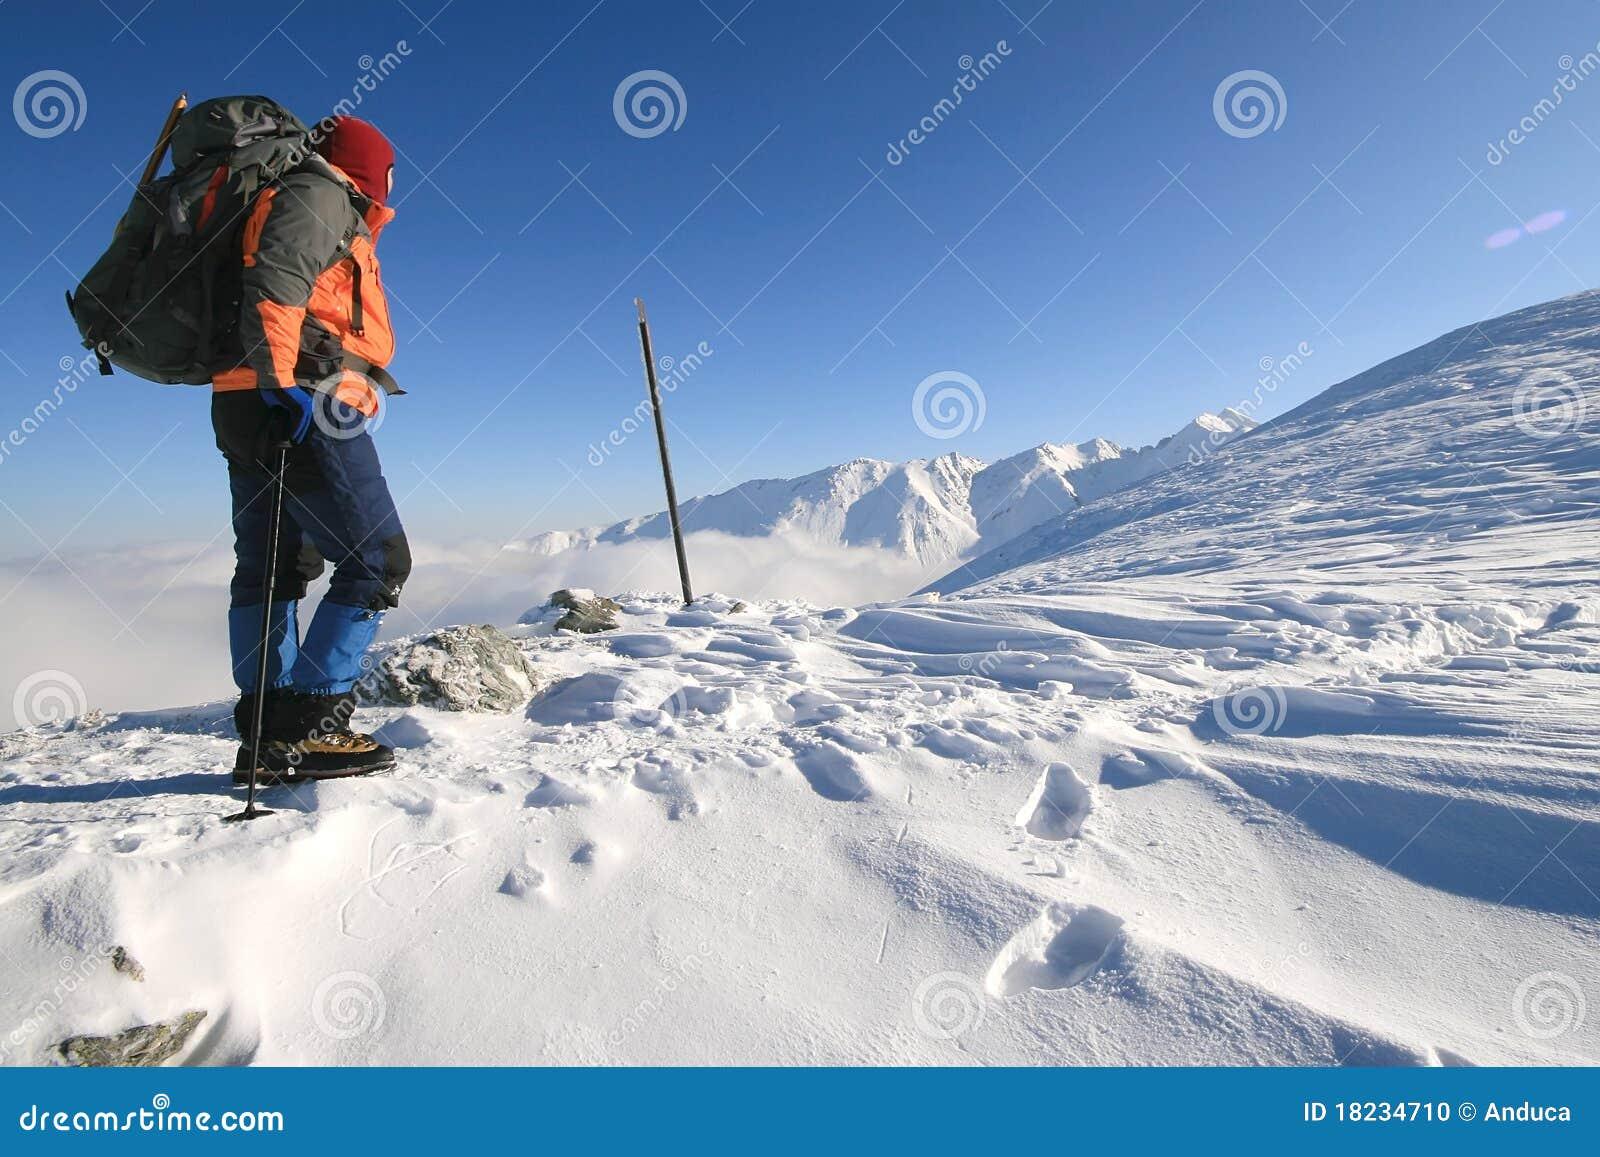 Trekking man resting